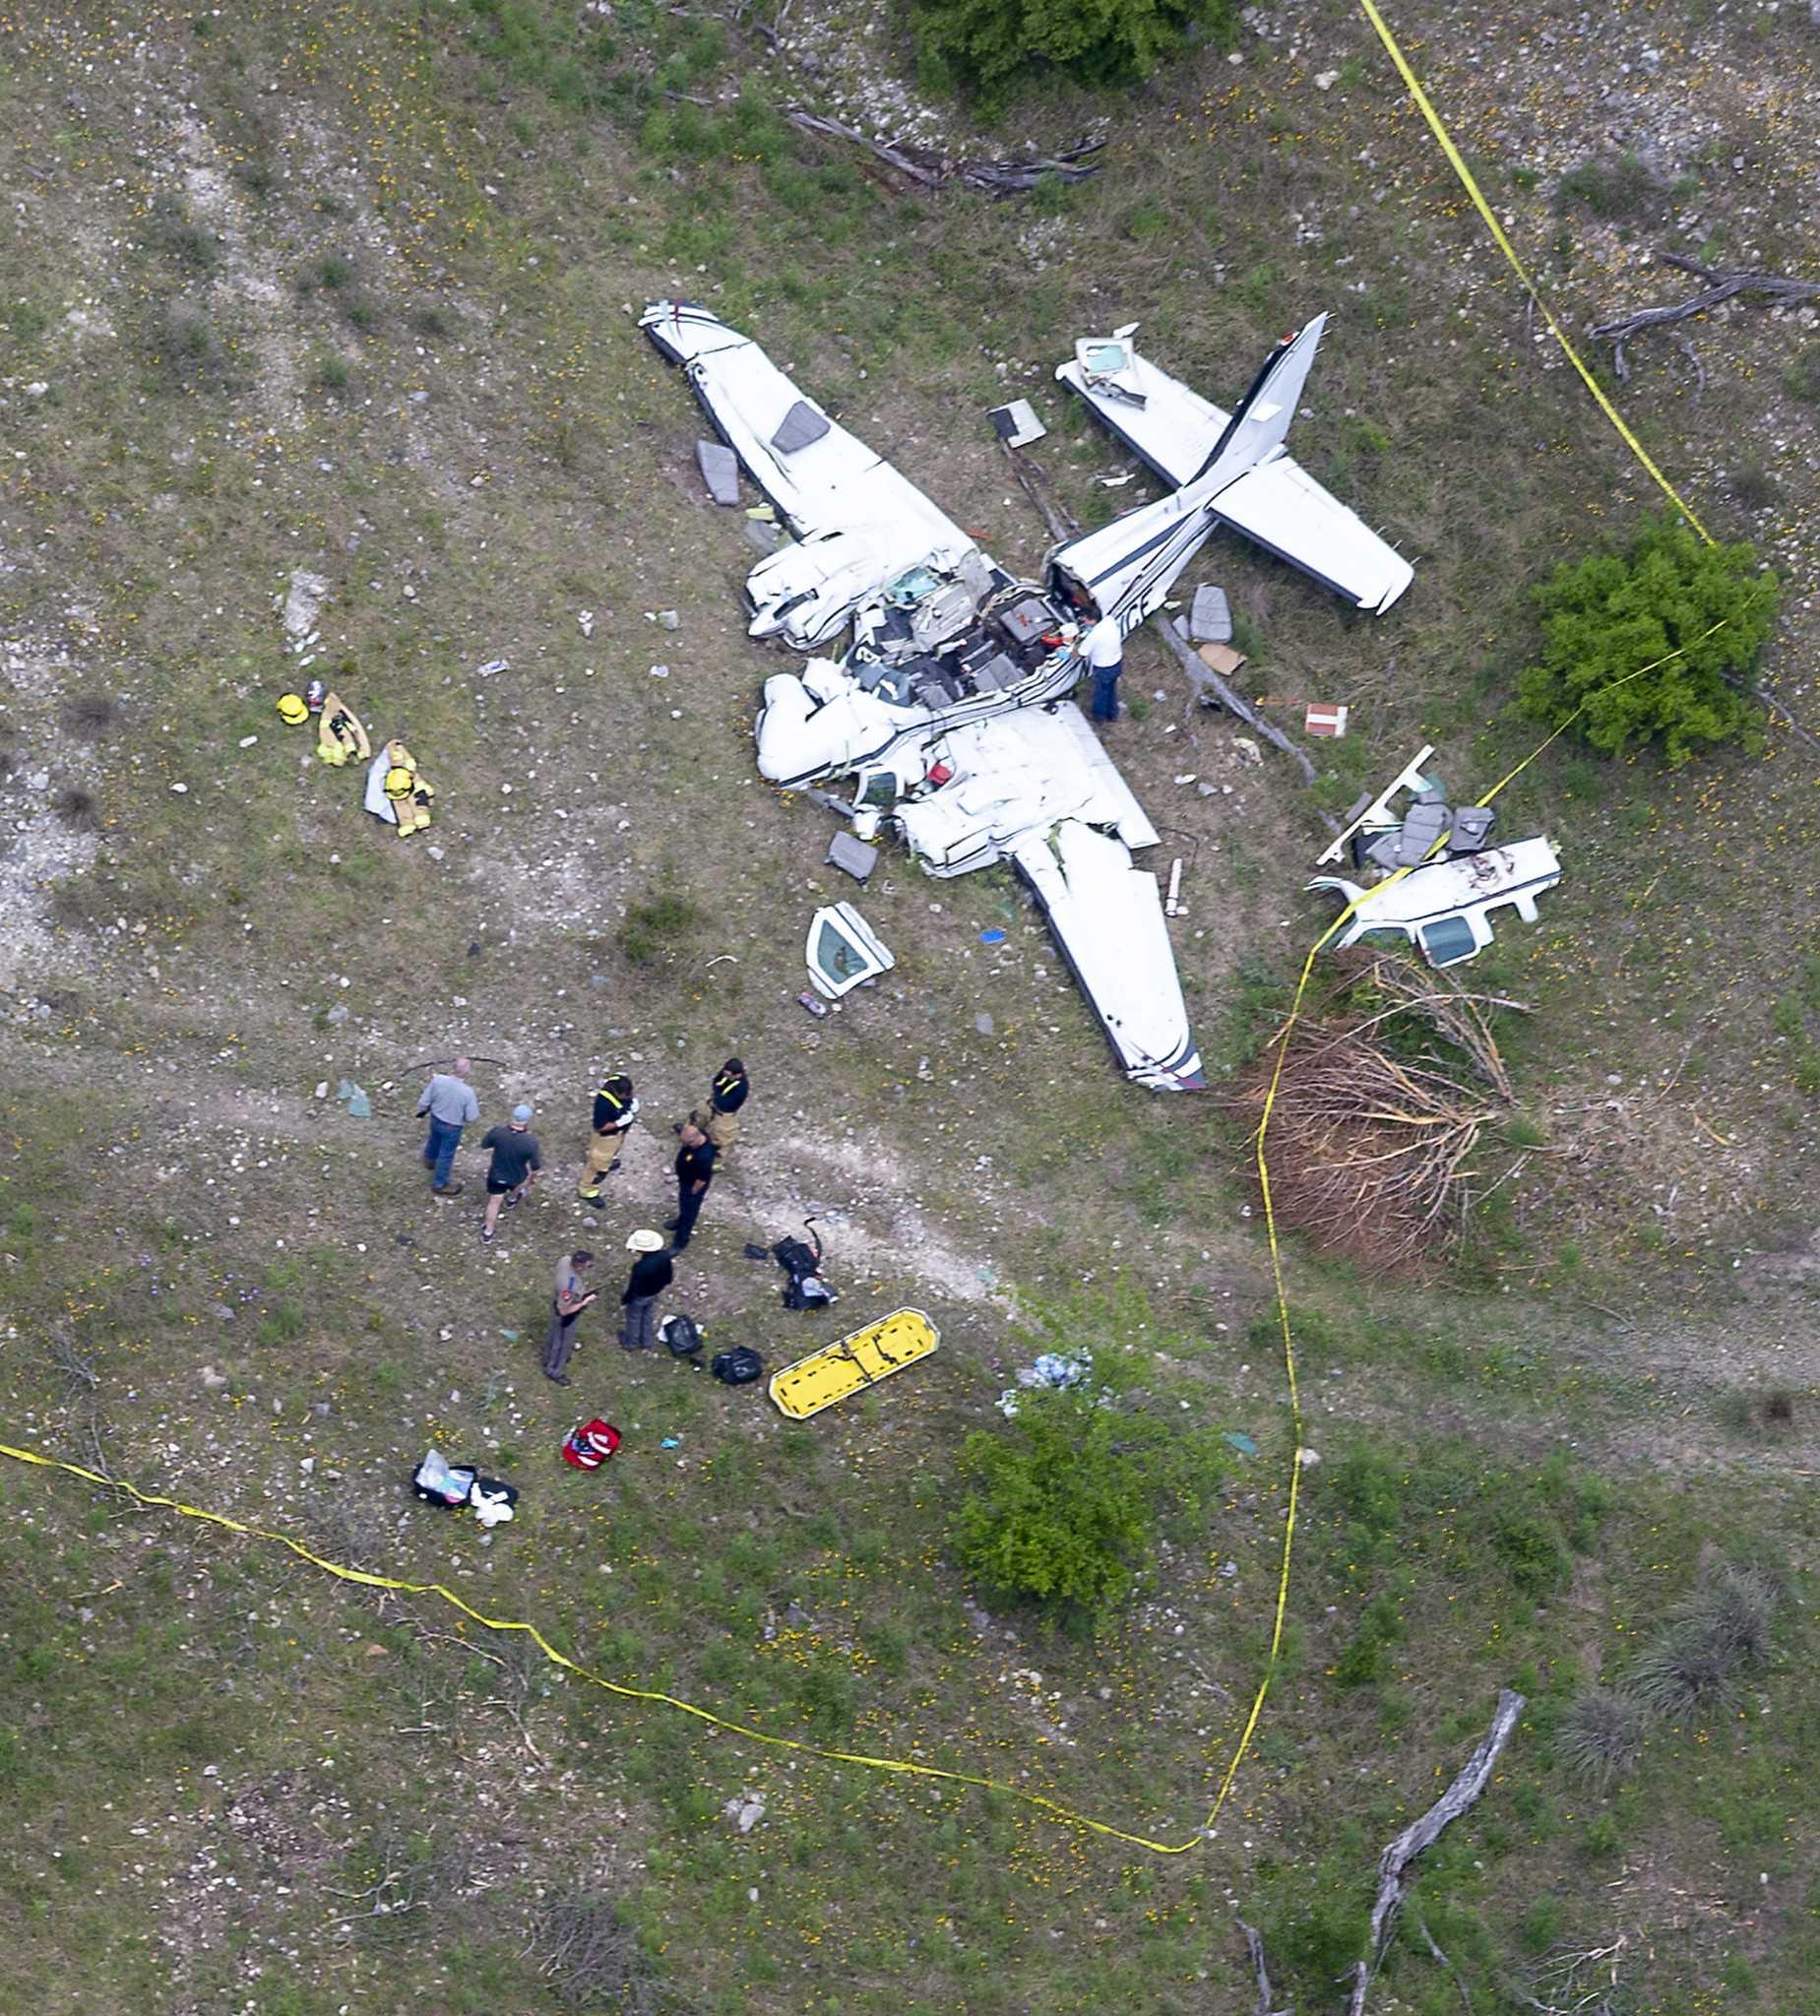 Auto Group San Antonio >> 6 dead in Kerrville plane crash, DPS confirms